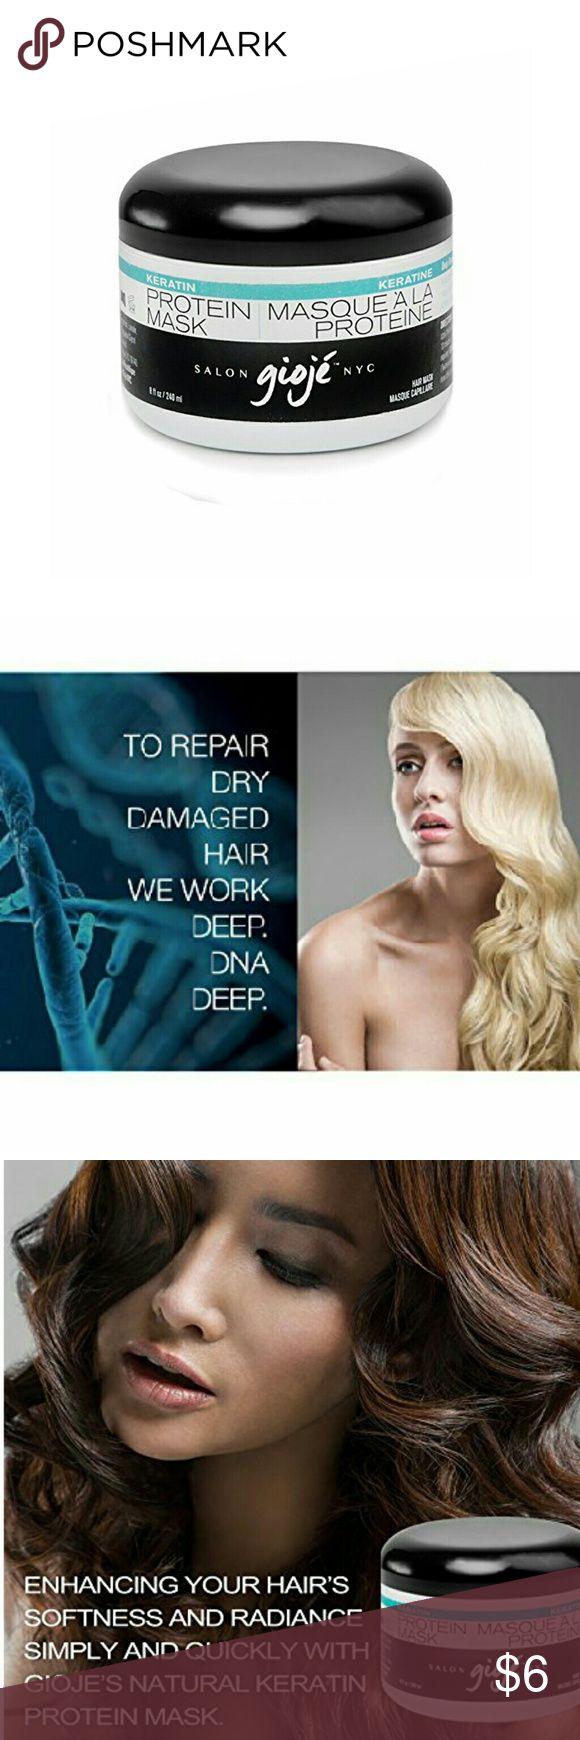 Salon Gioj Keratin Protein Mask. DeepRepairHair Salon